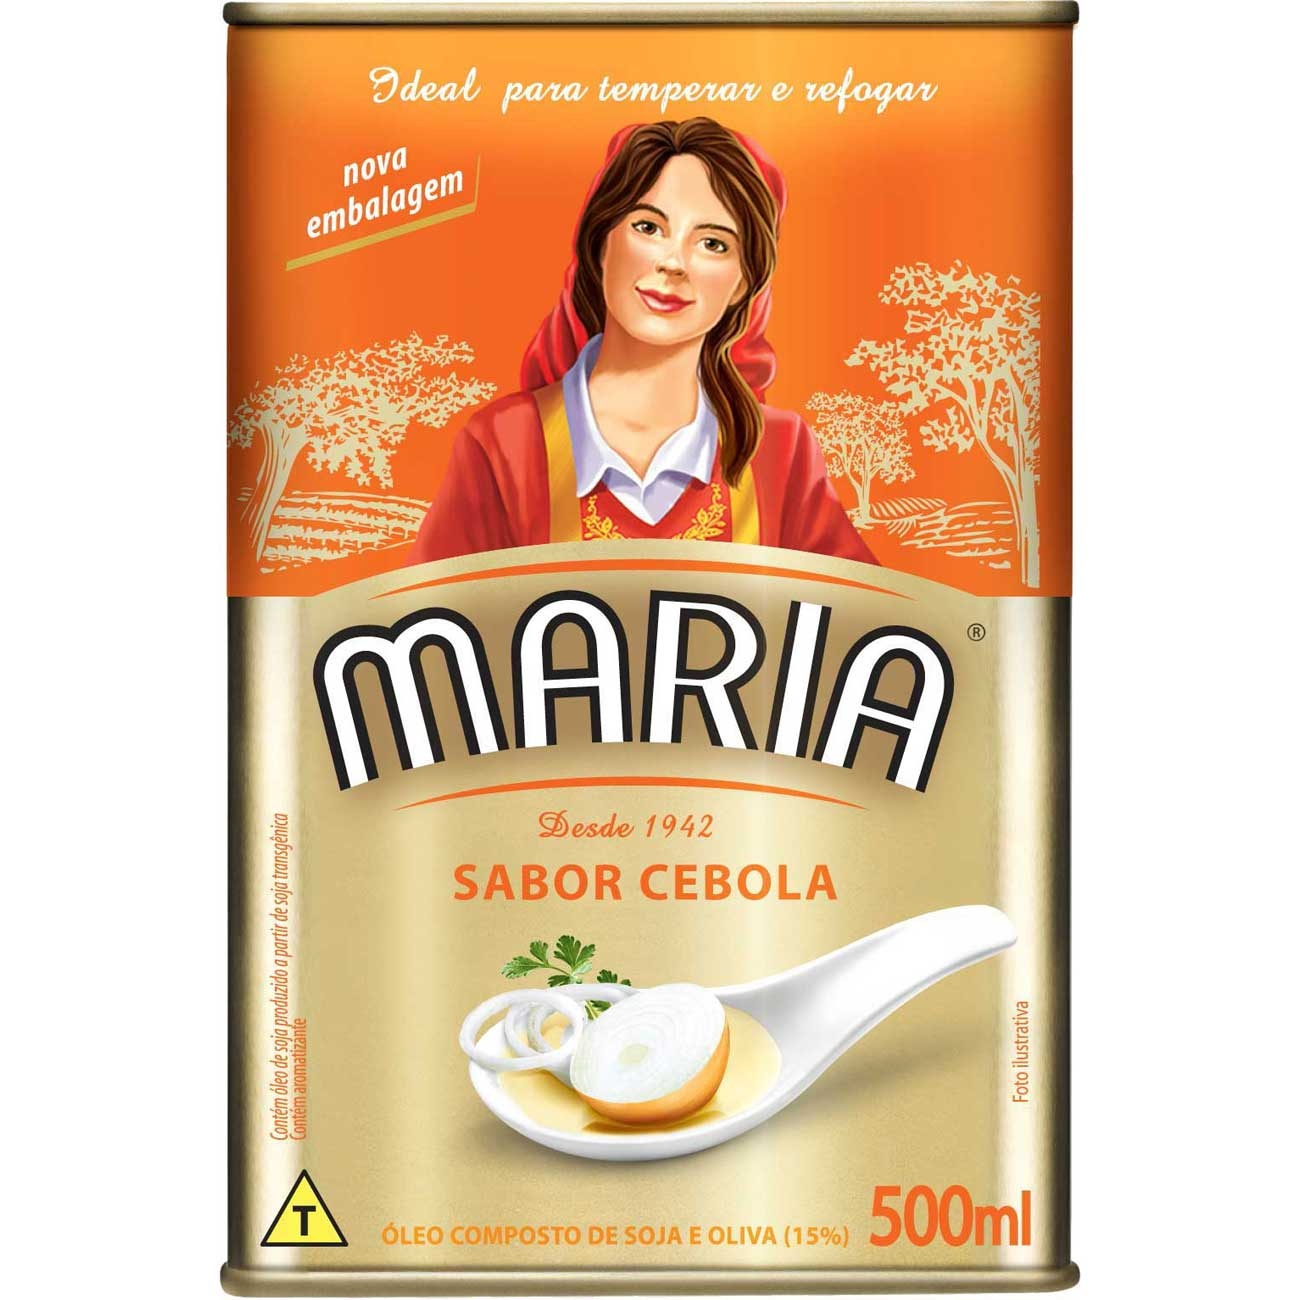 Oleo Composto Maria Cebola 500ml